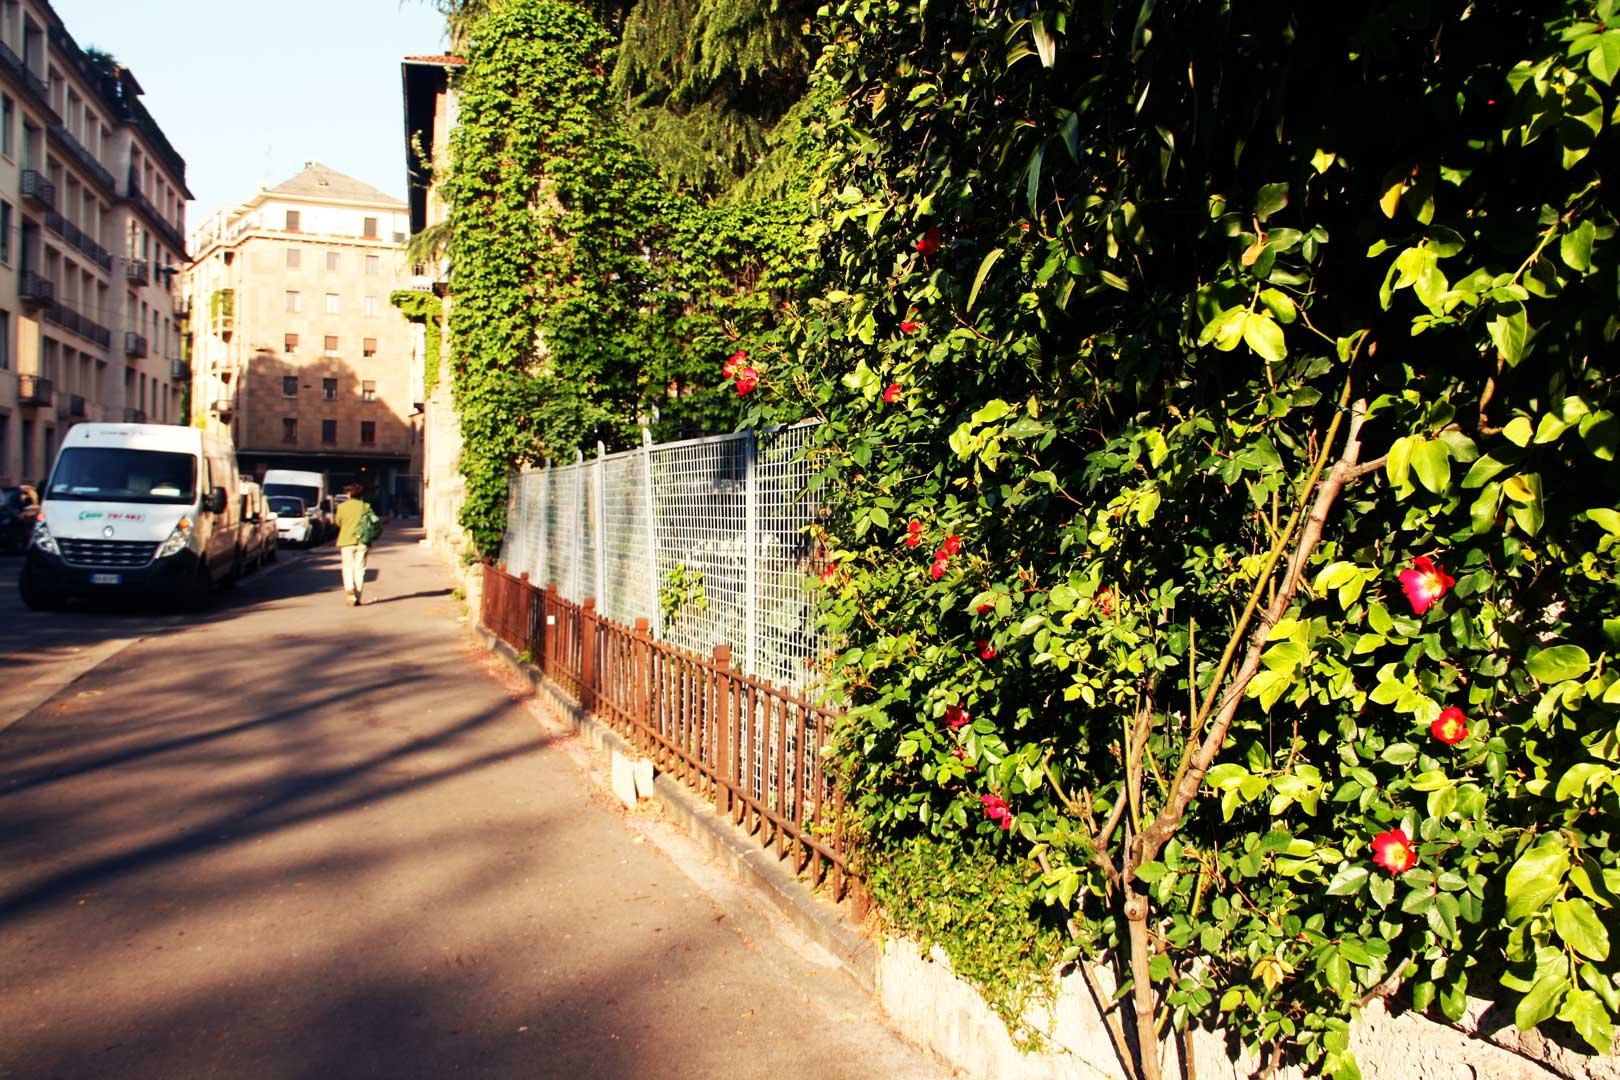 giardino-edibile-serbelloni-ringhiera